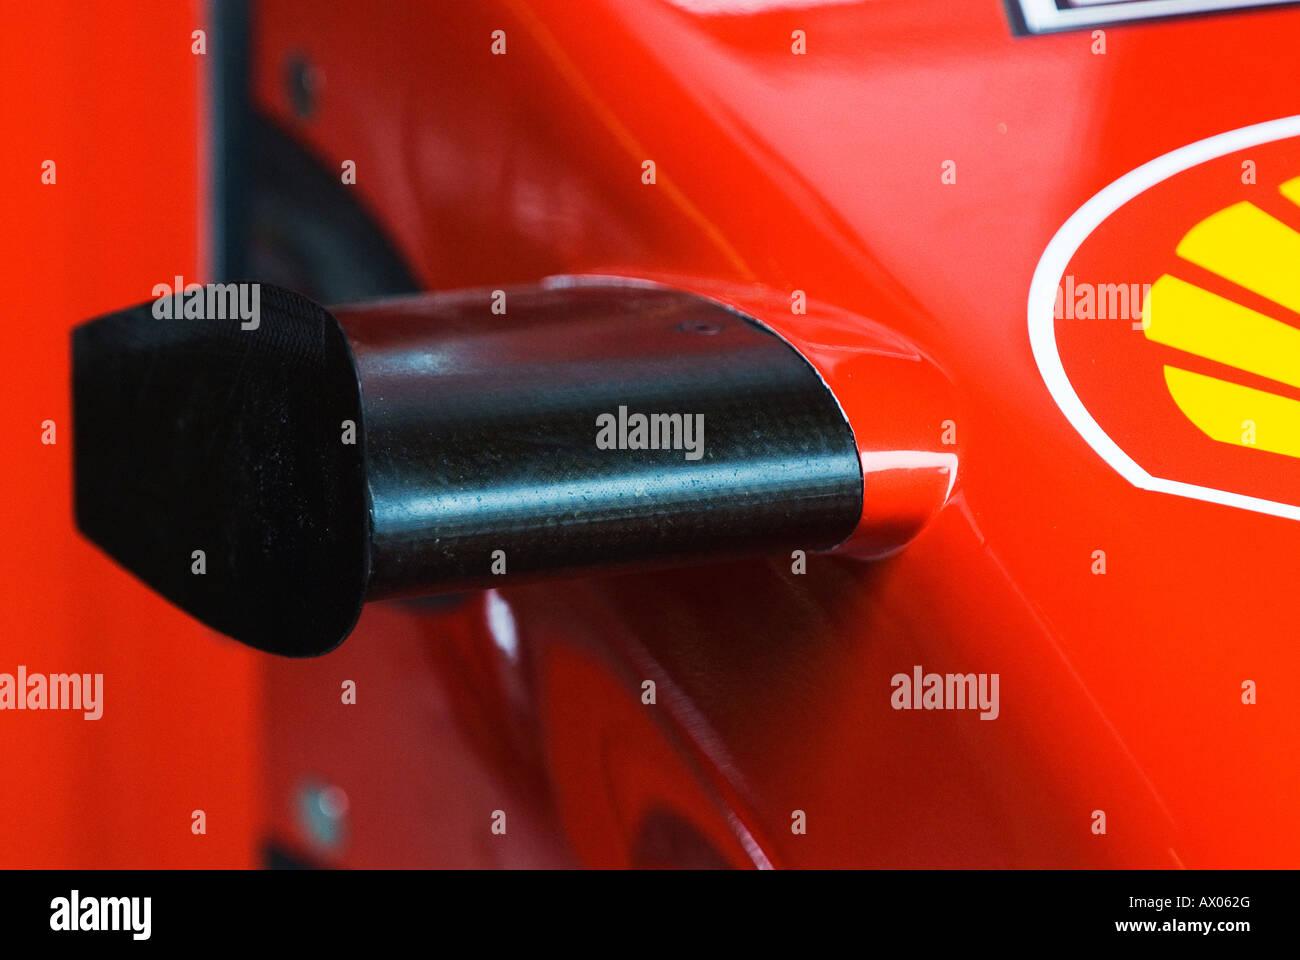 front wing on Ferrari Formula 1 racecar - Stock Image